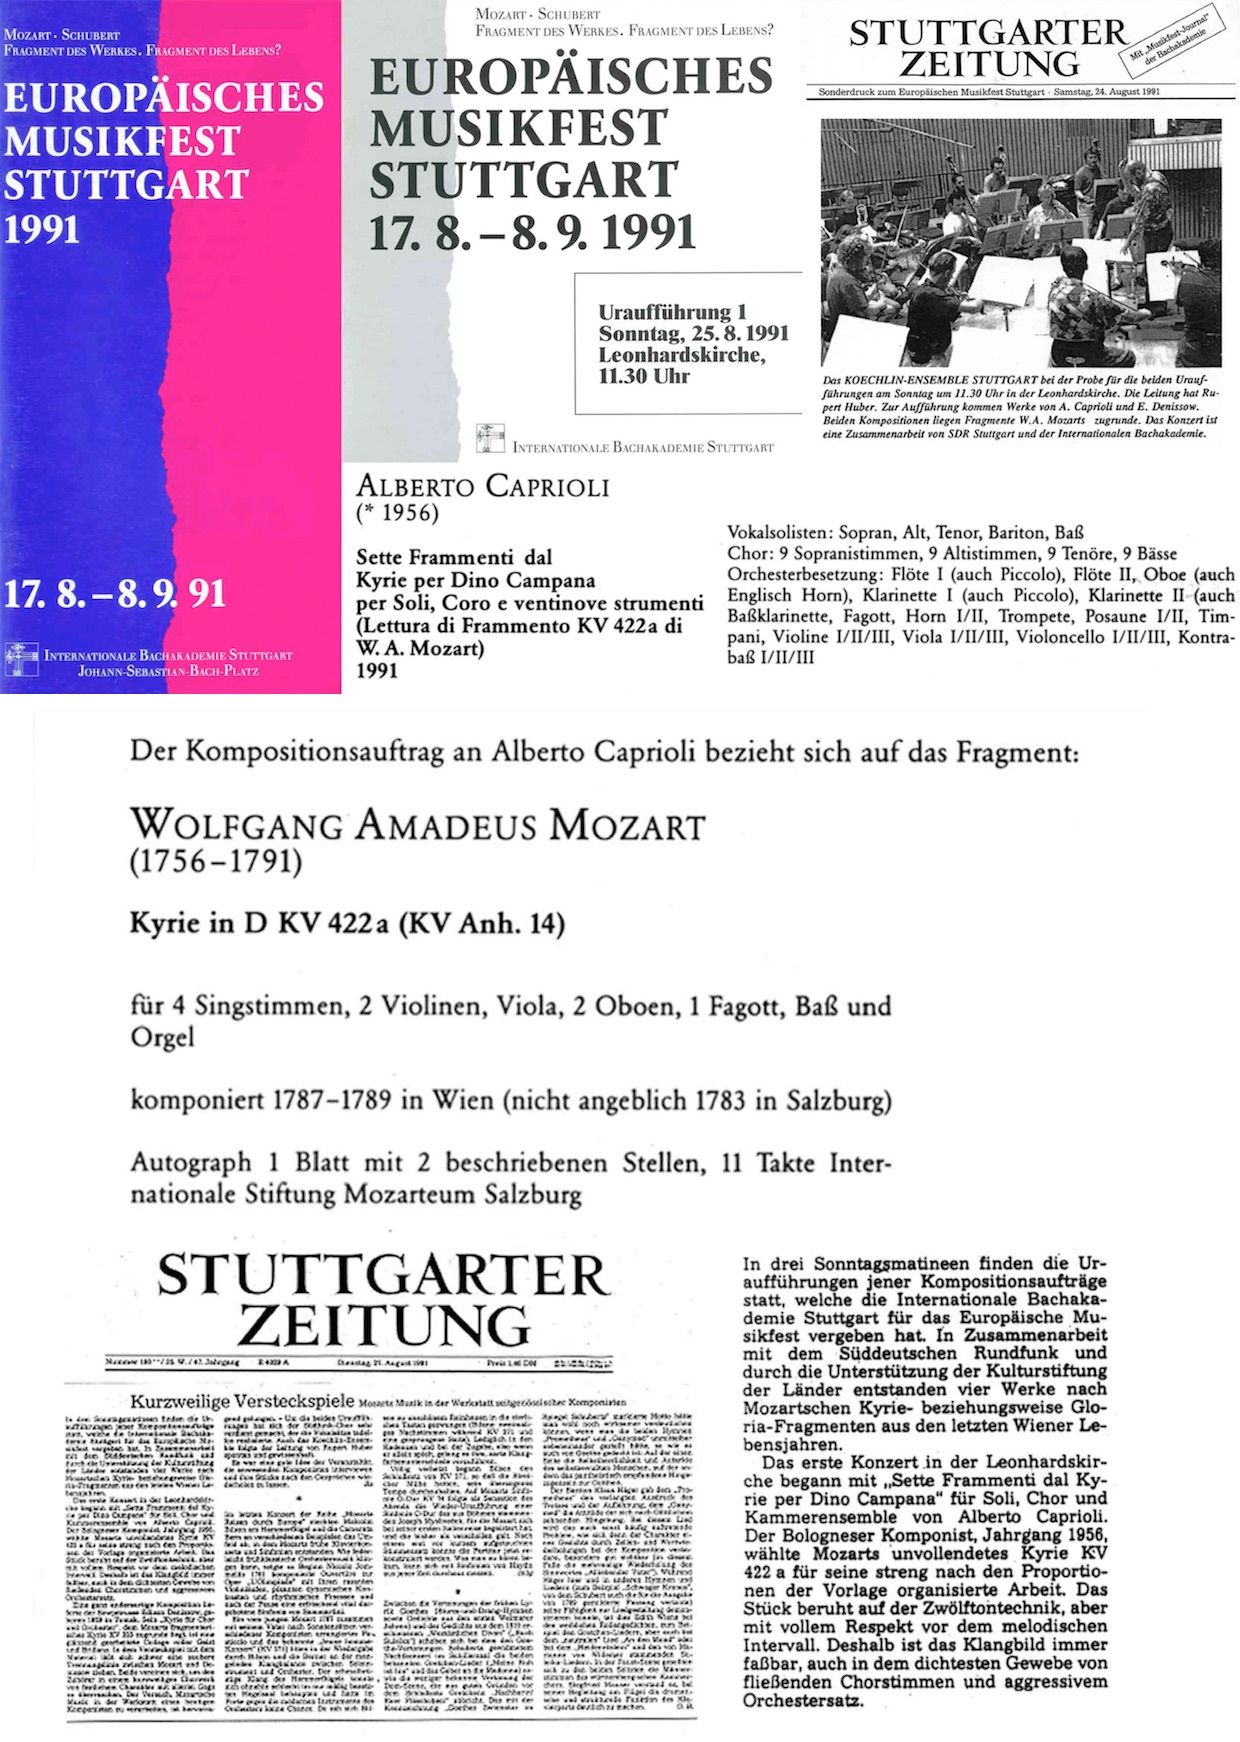 EUROPÄISCHES MUSIKFEST STUTTGART 1991